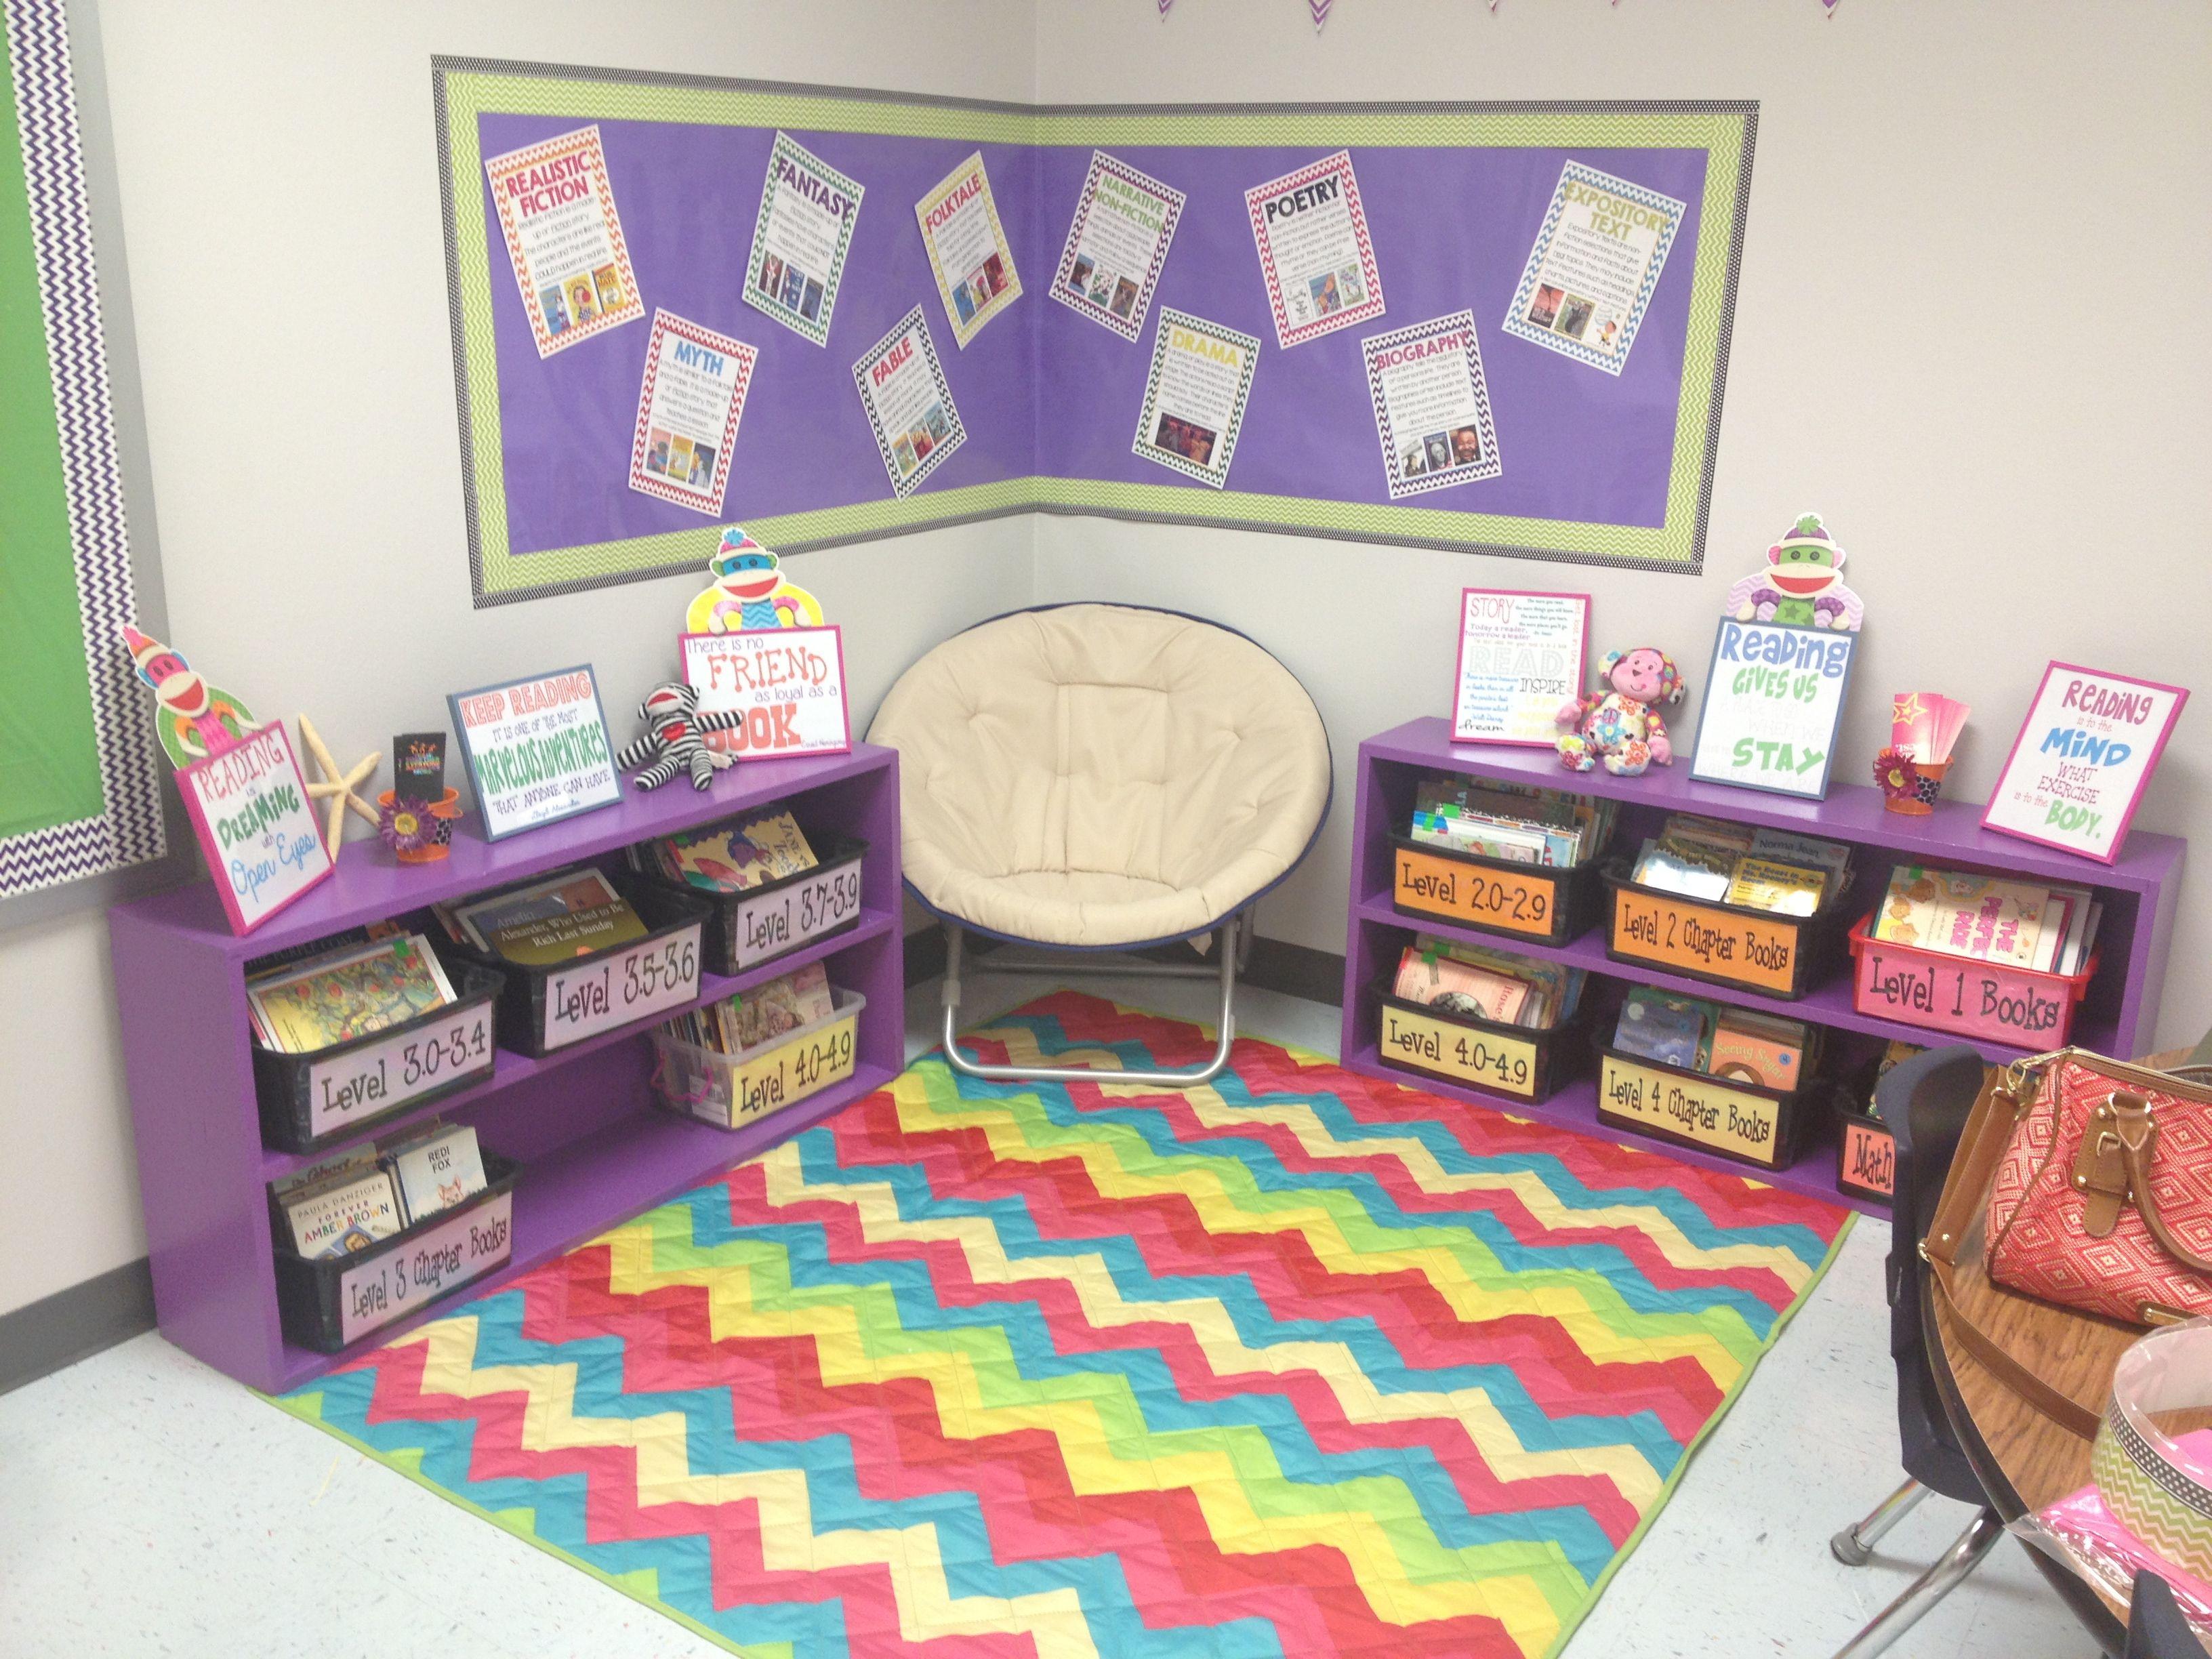 Classroom Library Ideas : Library ideas on pinterest elementary school